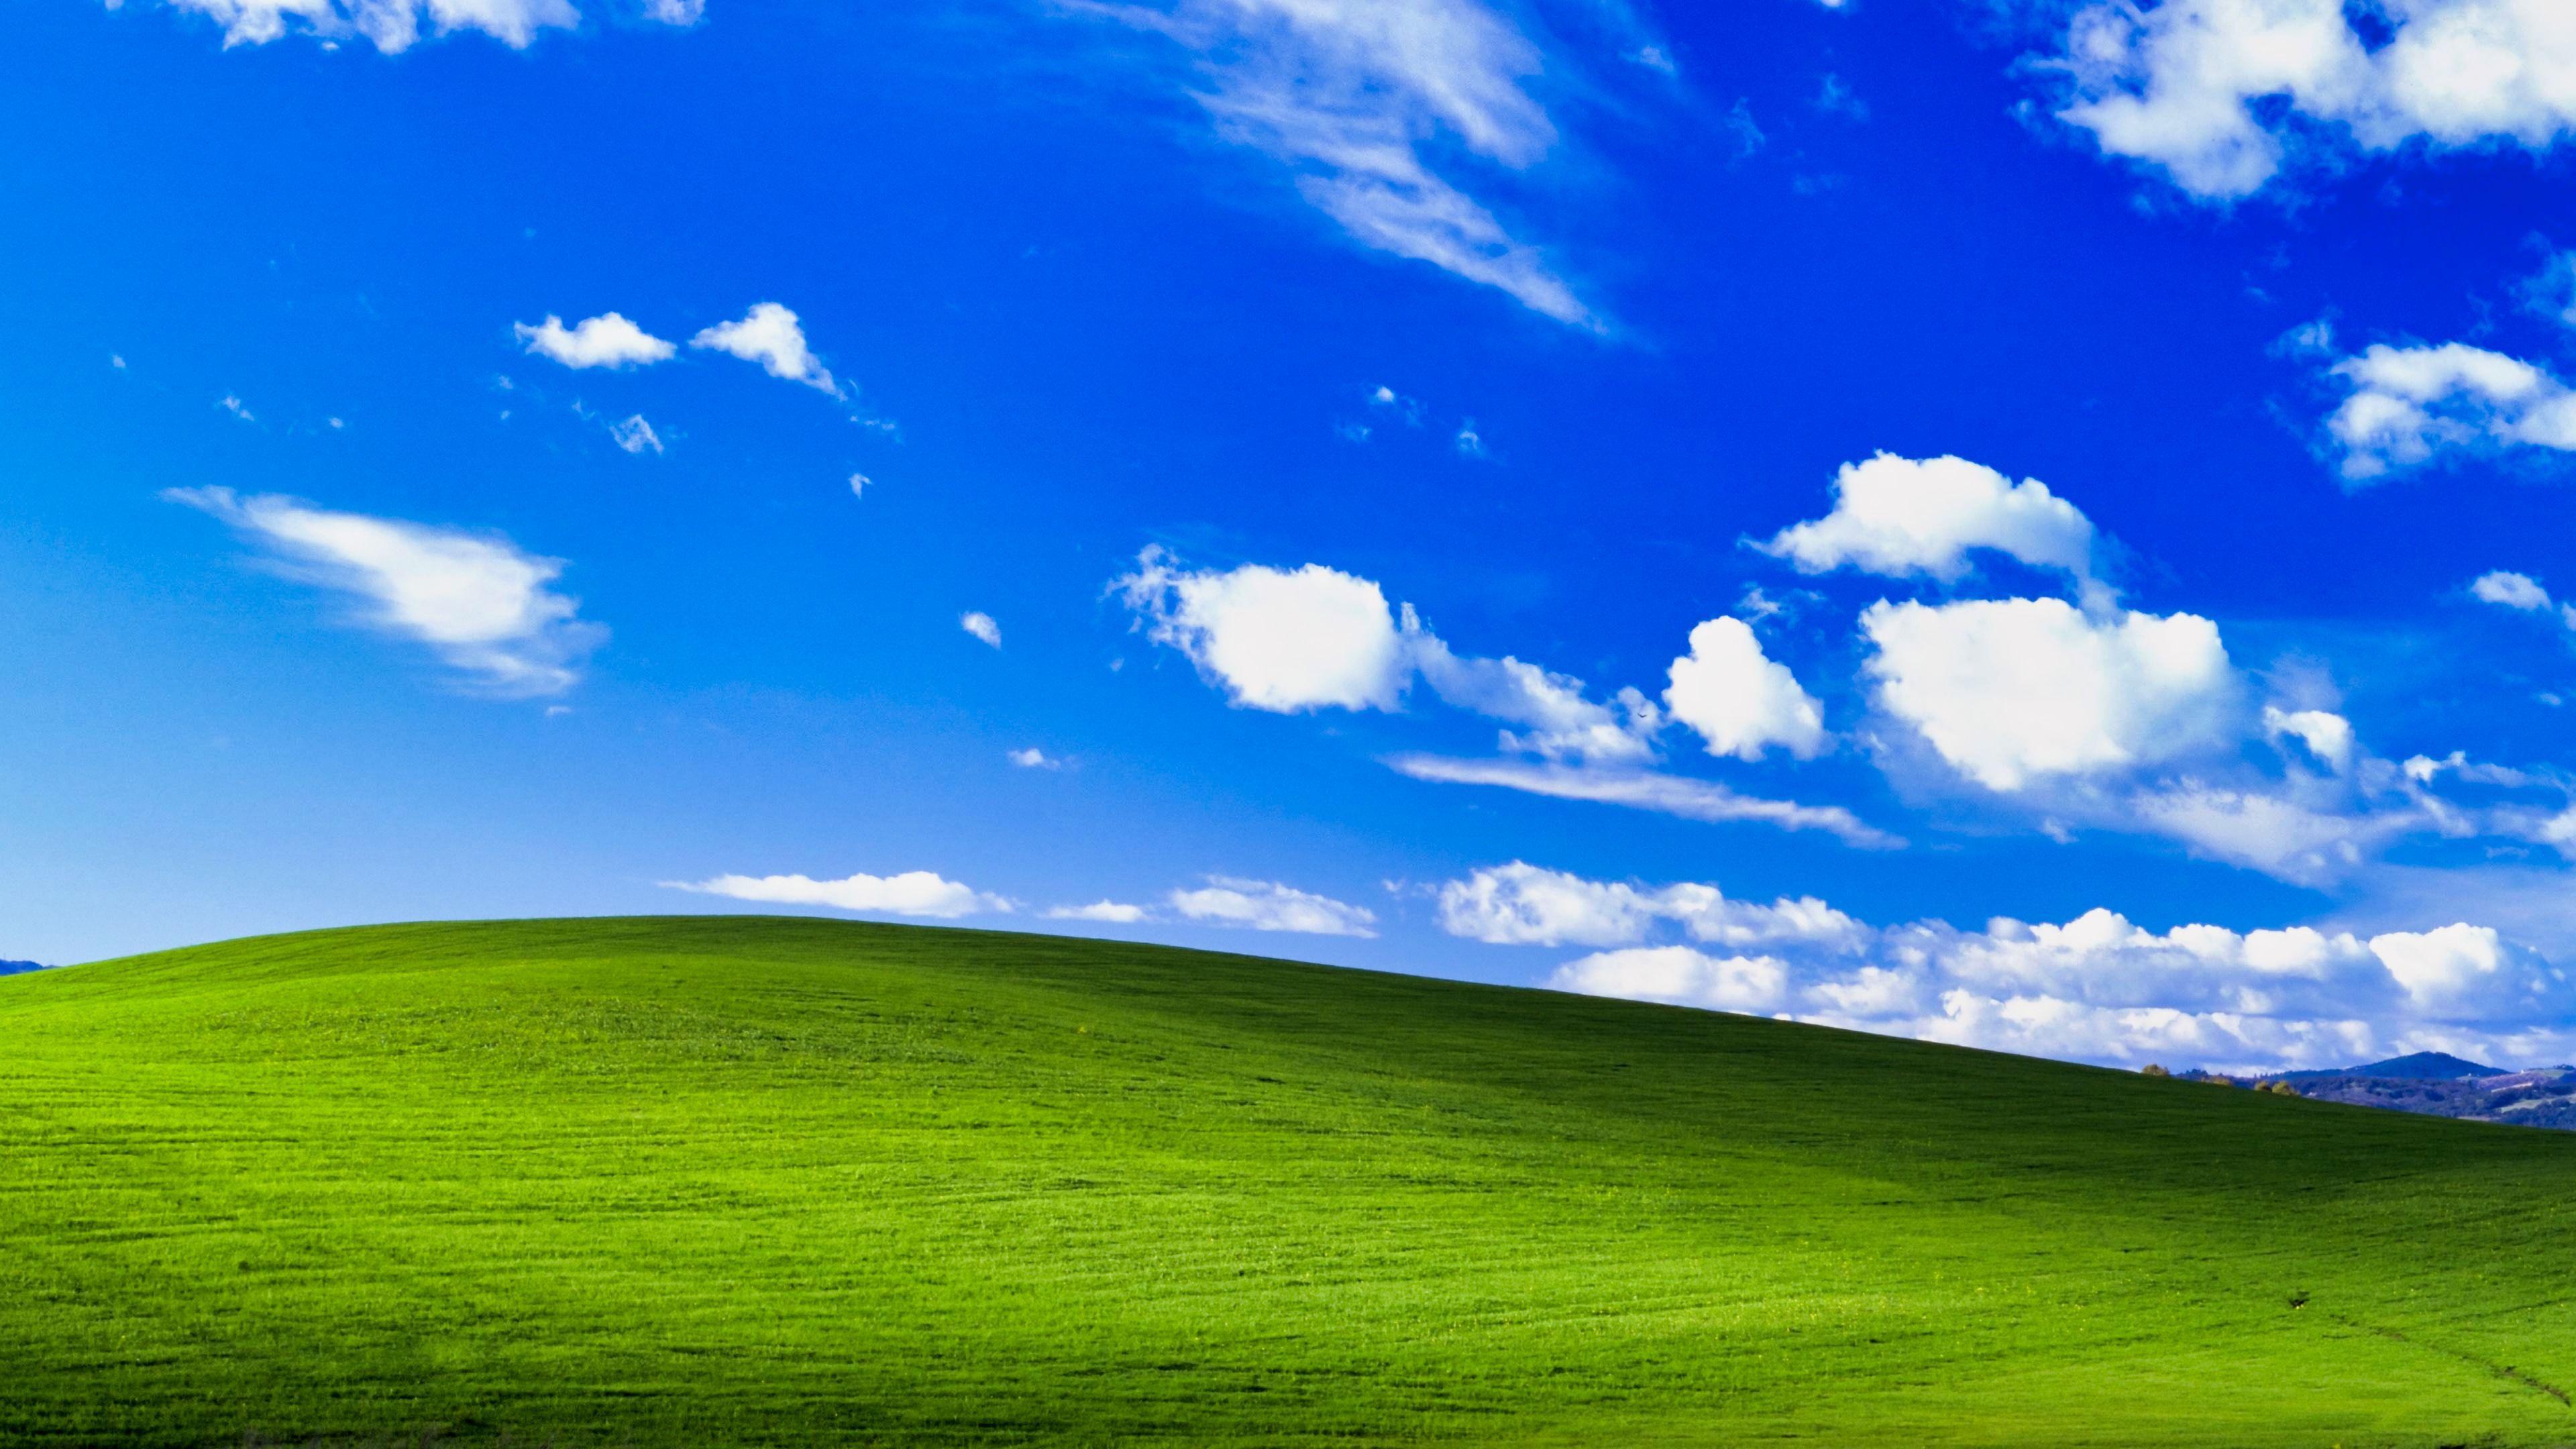 Original Windows Wallpapers - Top Free Original Windows Backgrounds -  WallpaperAccess